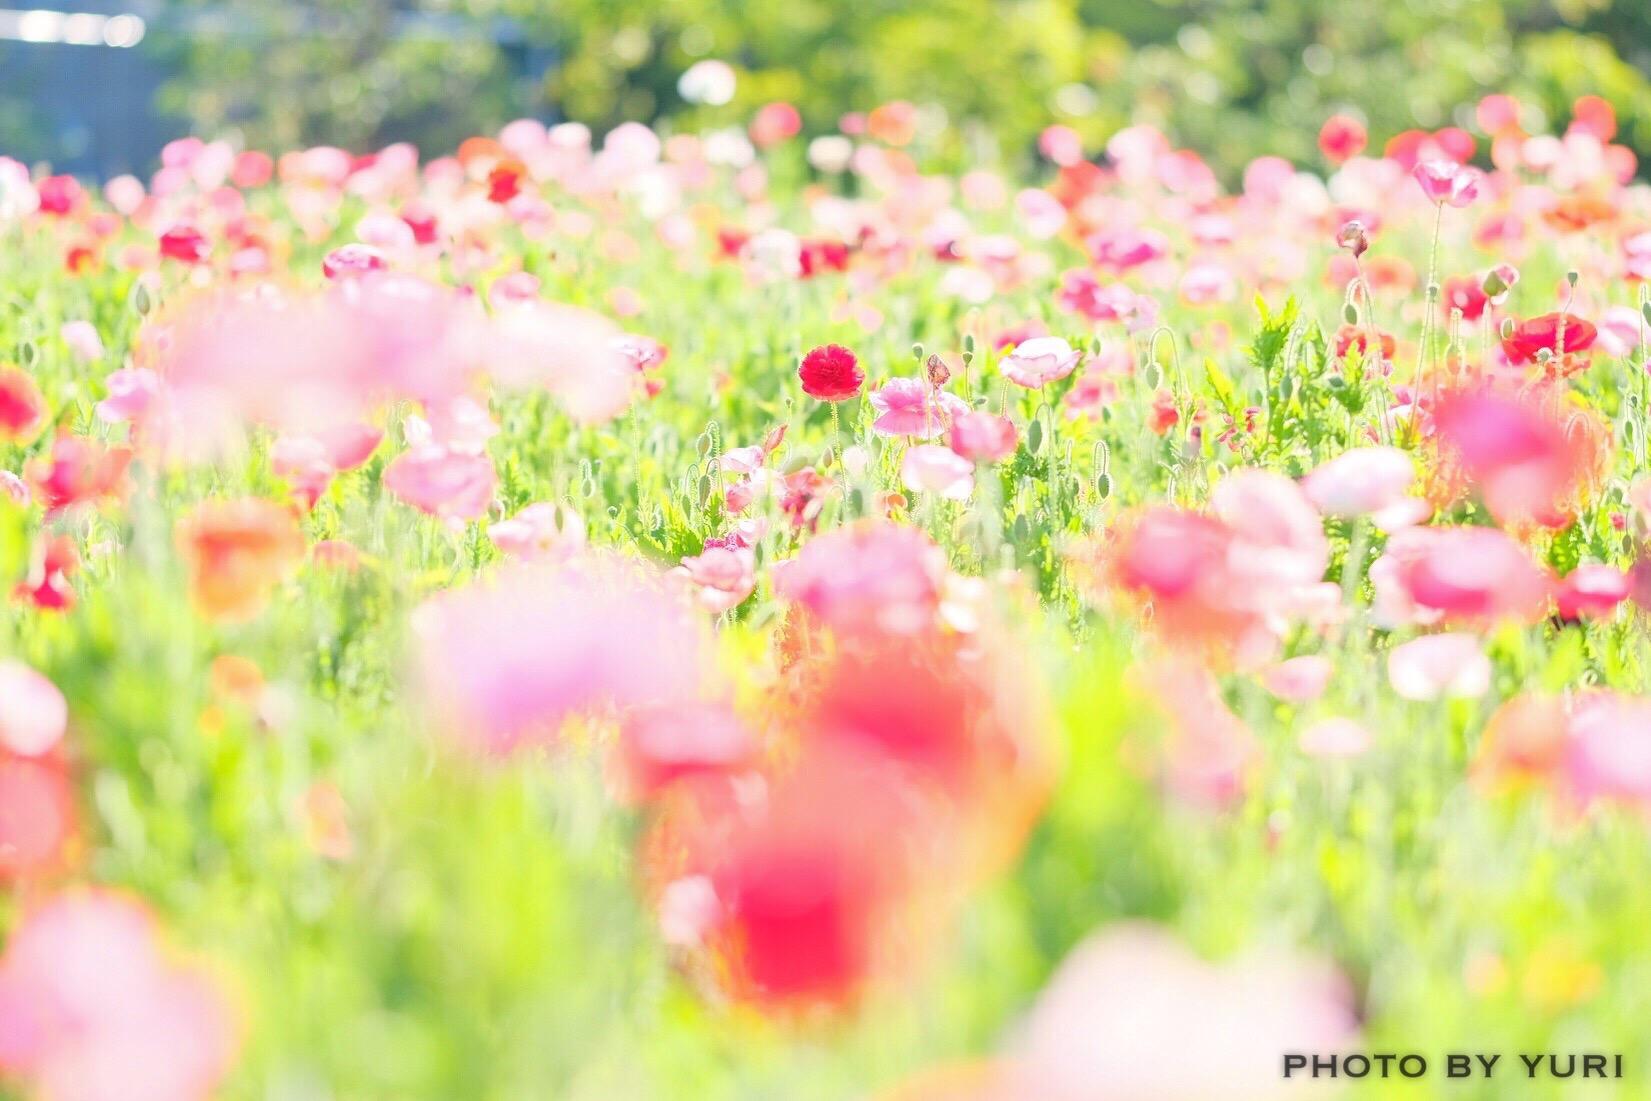 ZEKKEI Japanと「花×絶景」をテーマに、コラボ壁紙を作成しました